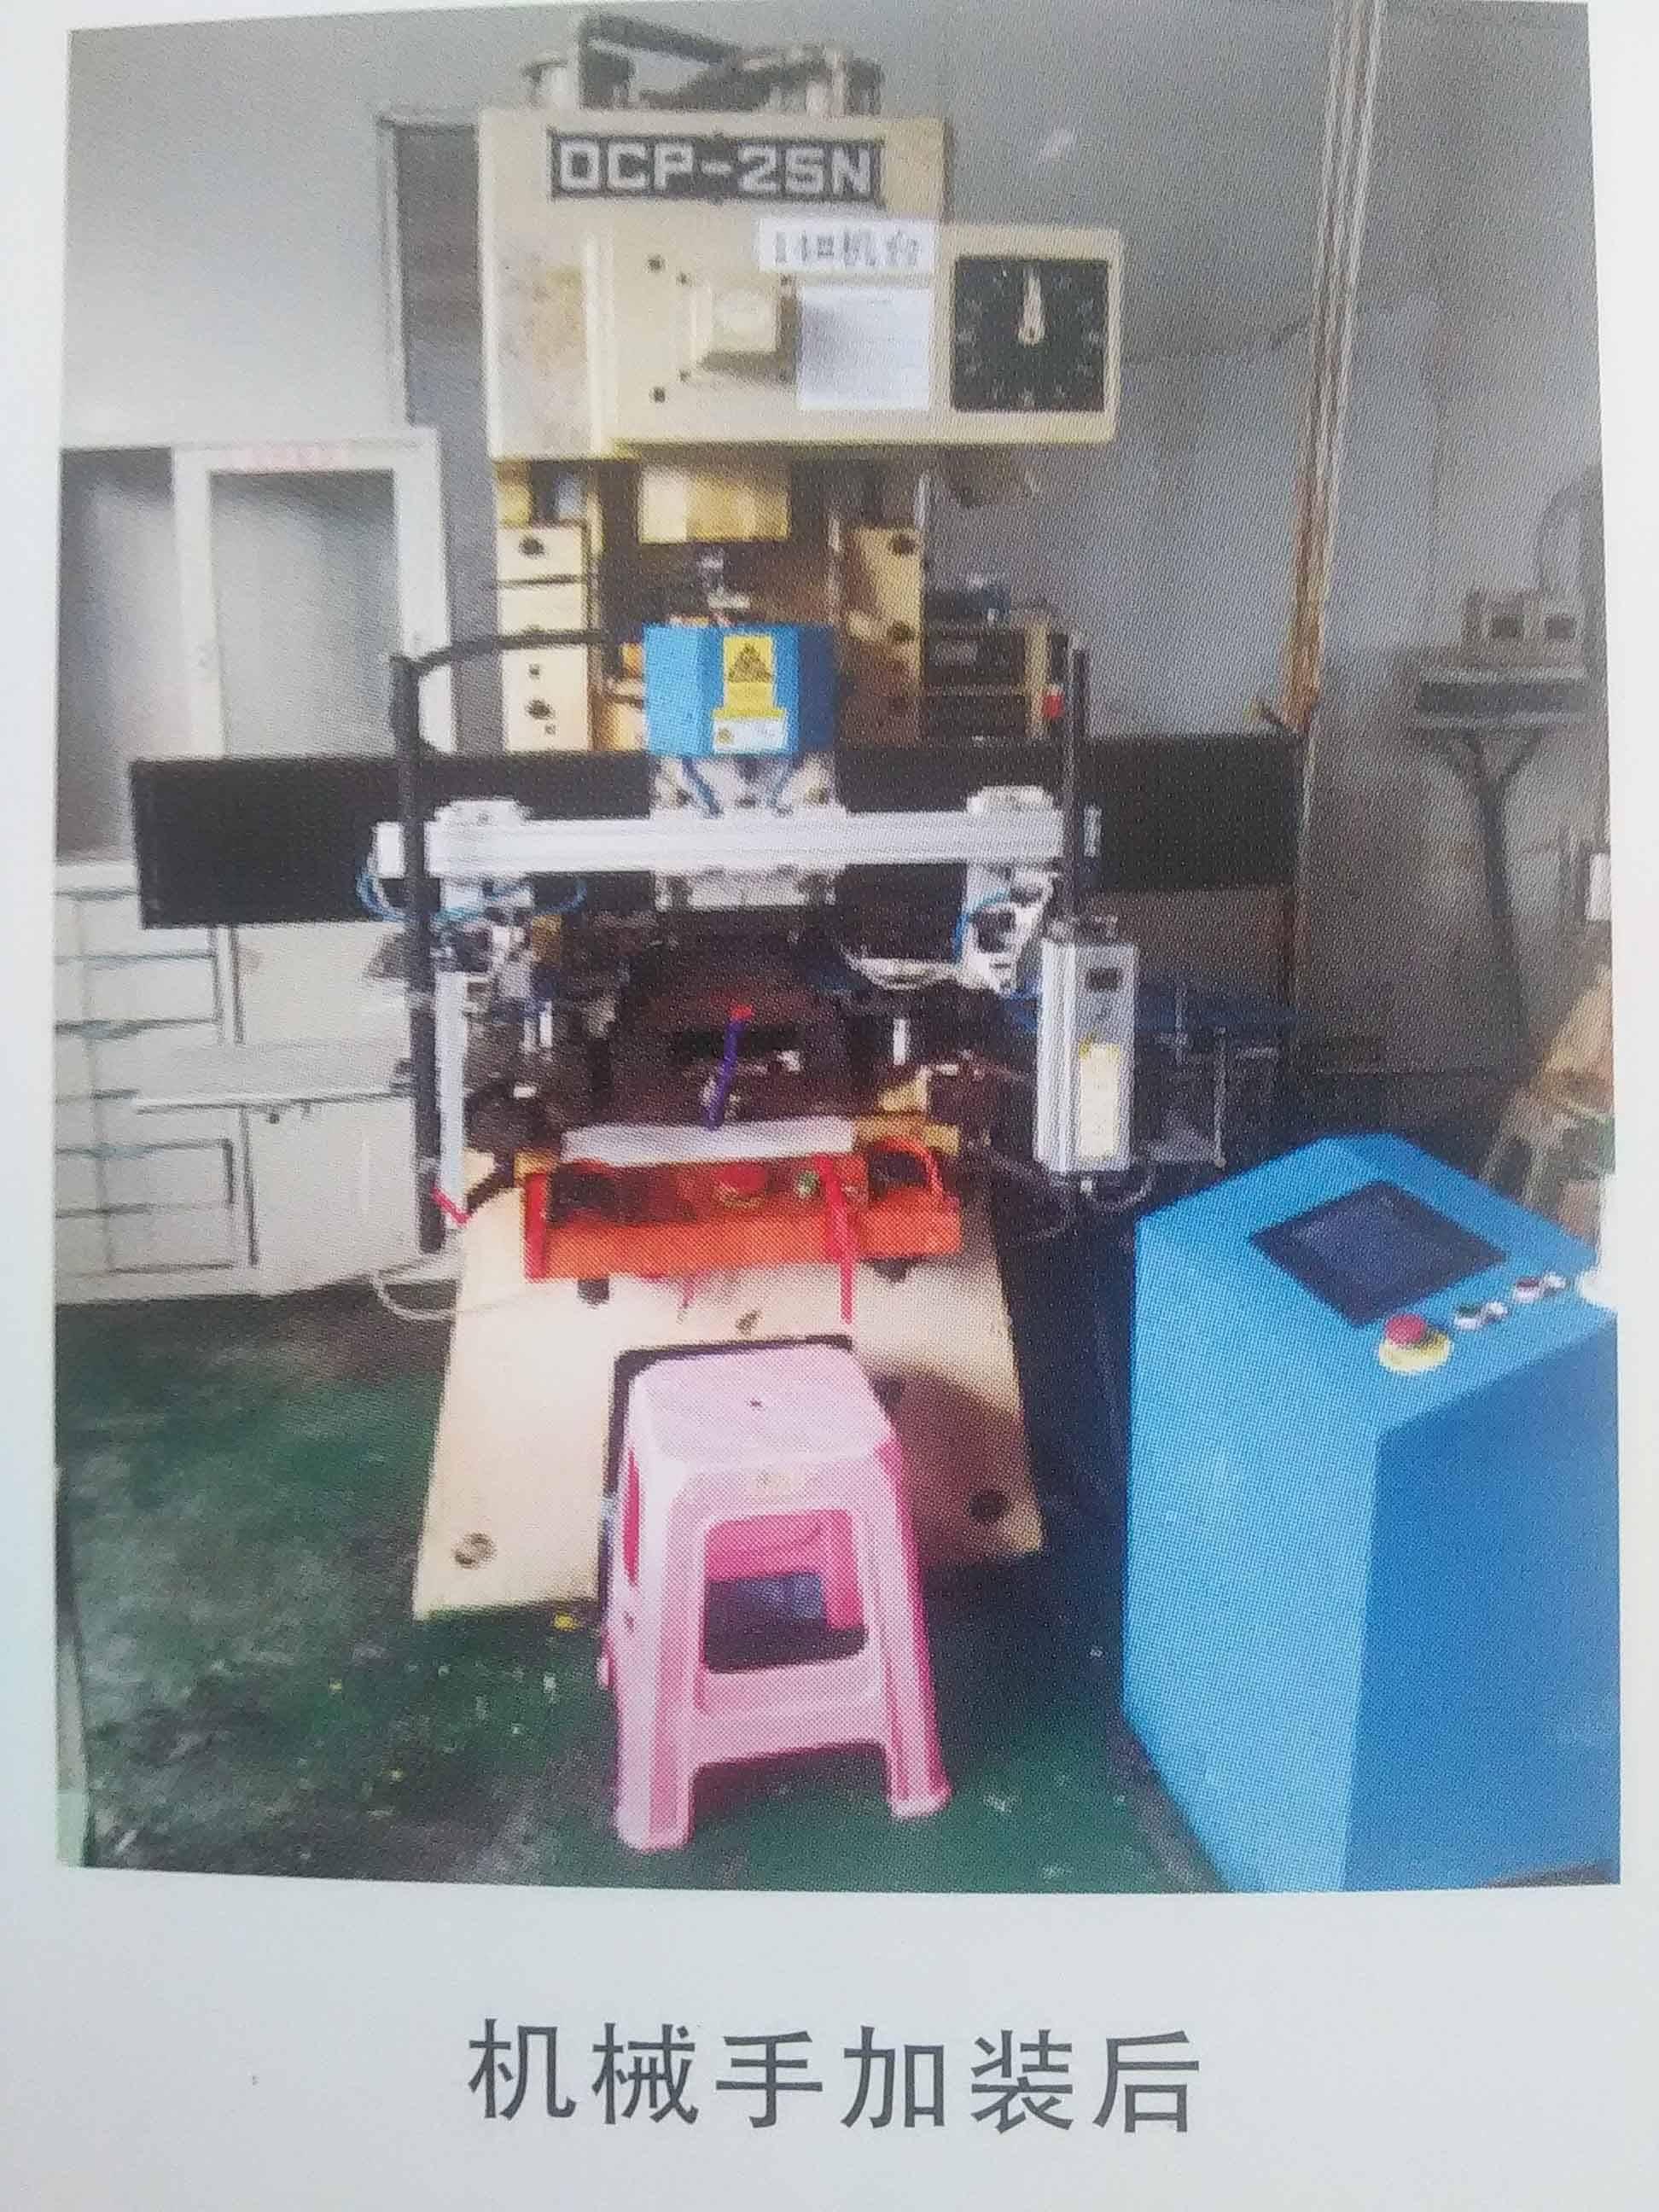 Automatic stamping manipulator